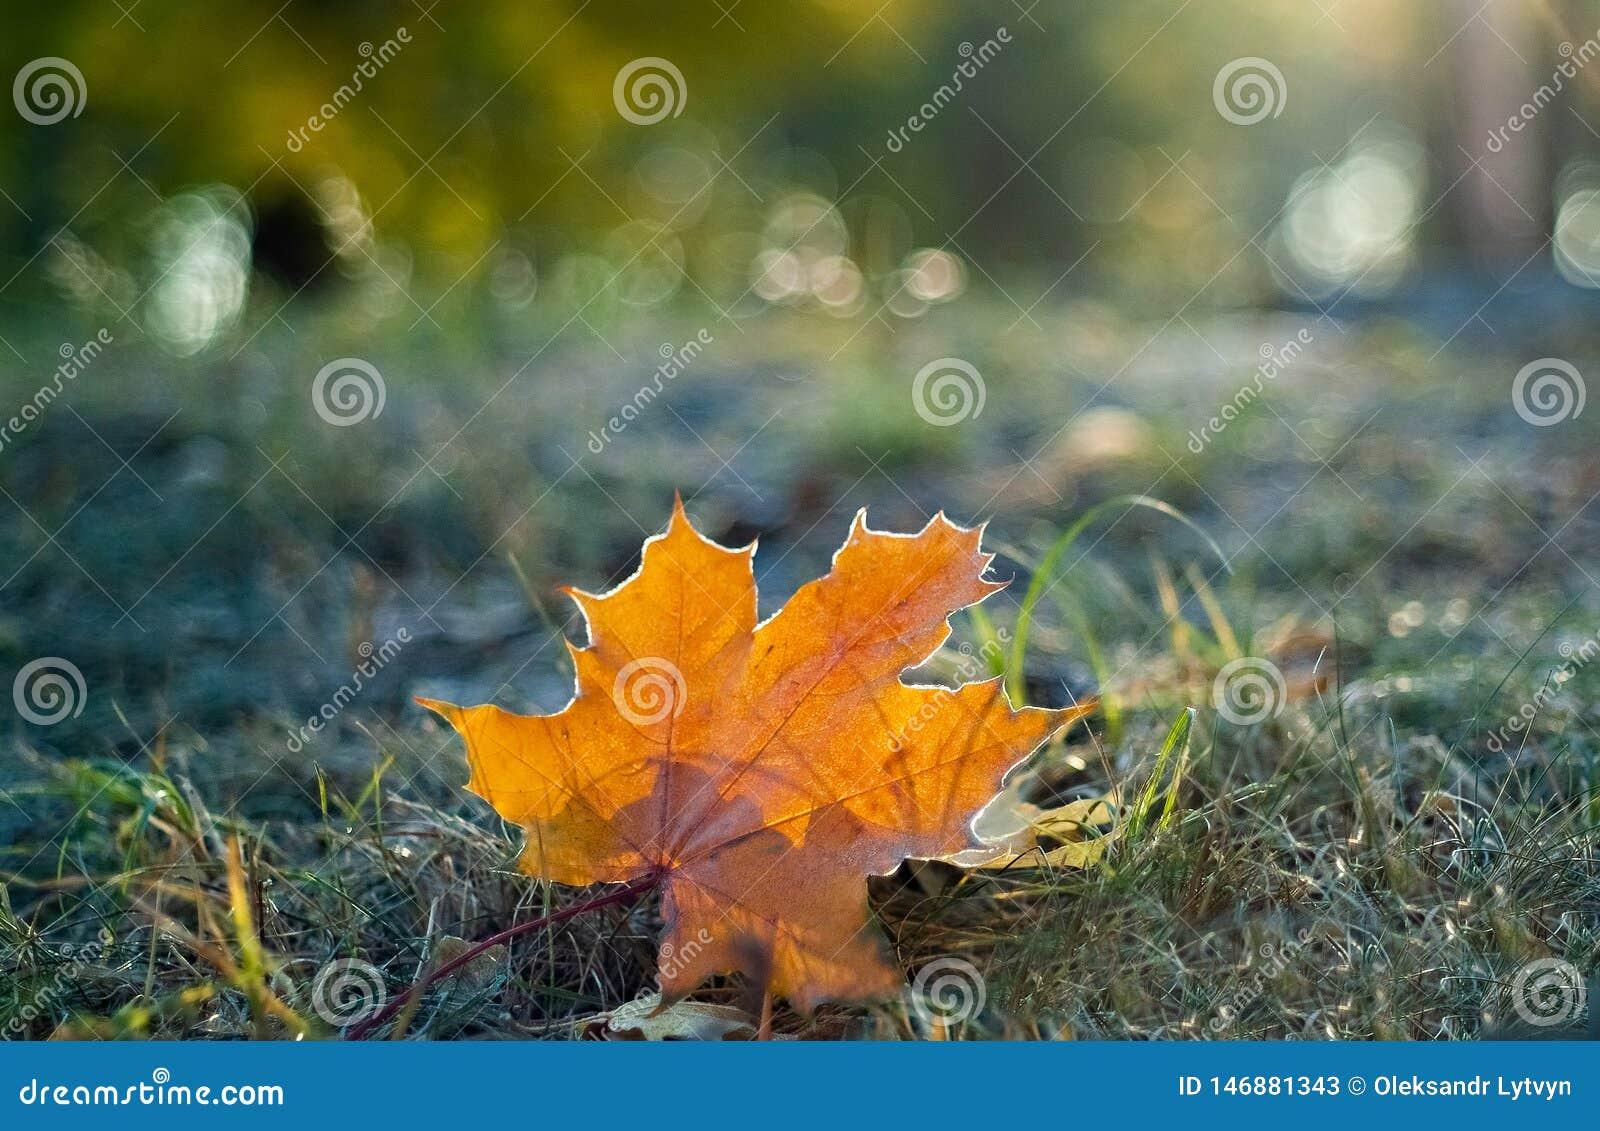 Orange Ahornblatt auf dem Gras im Reif